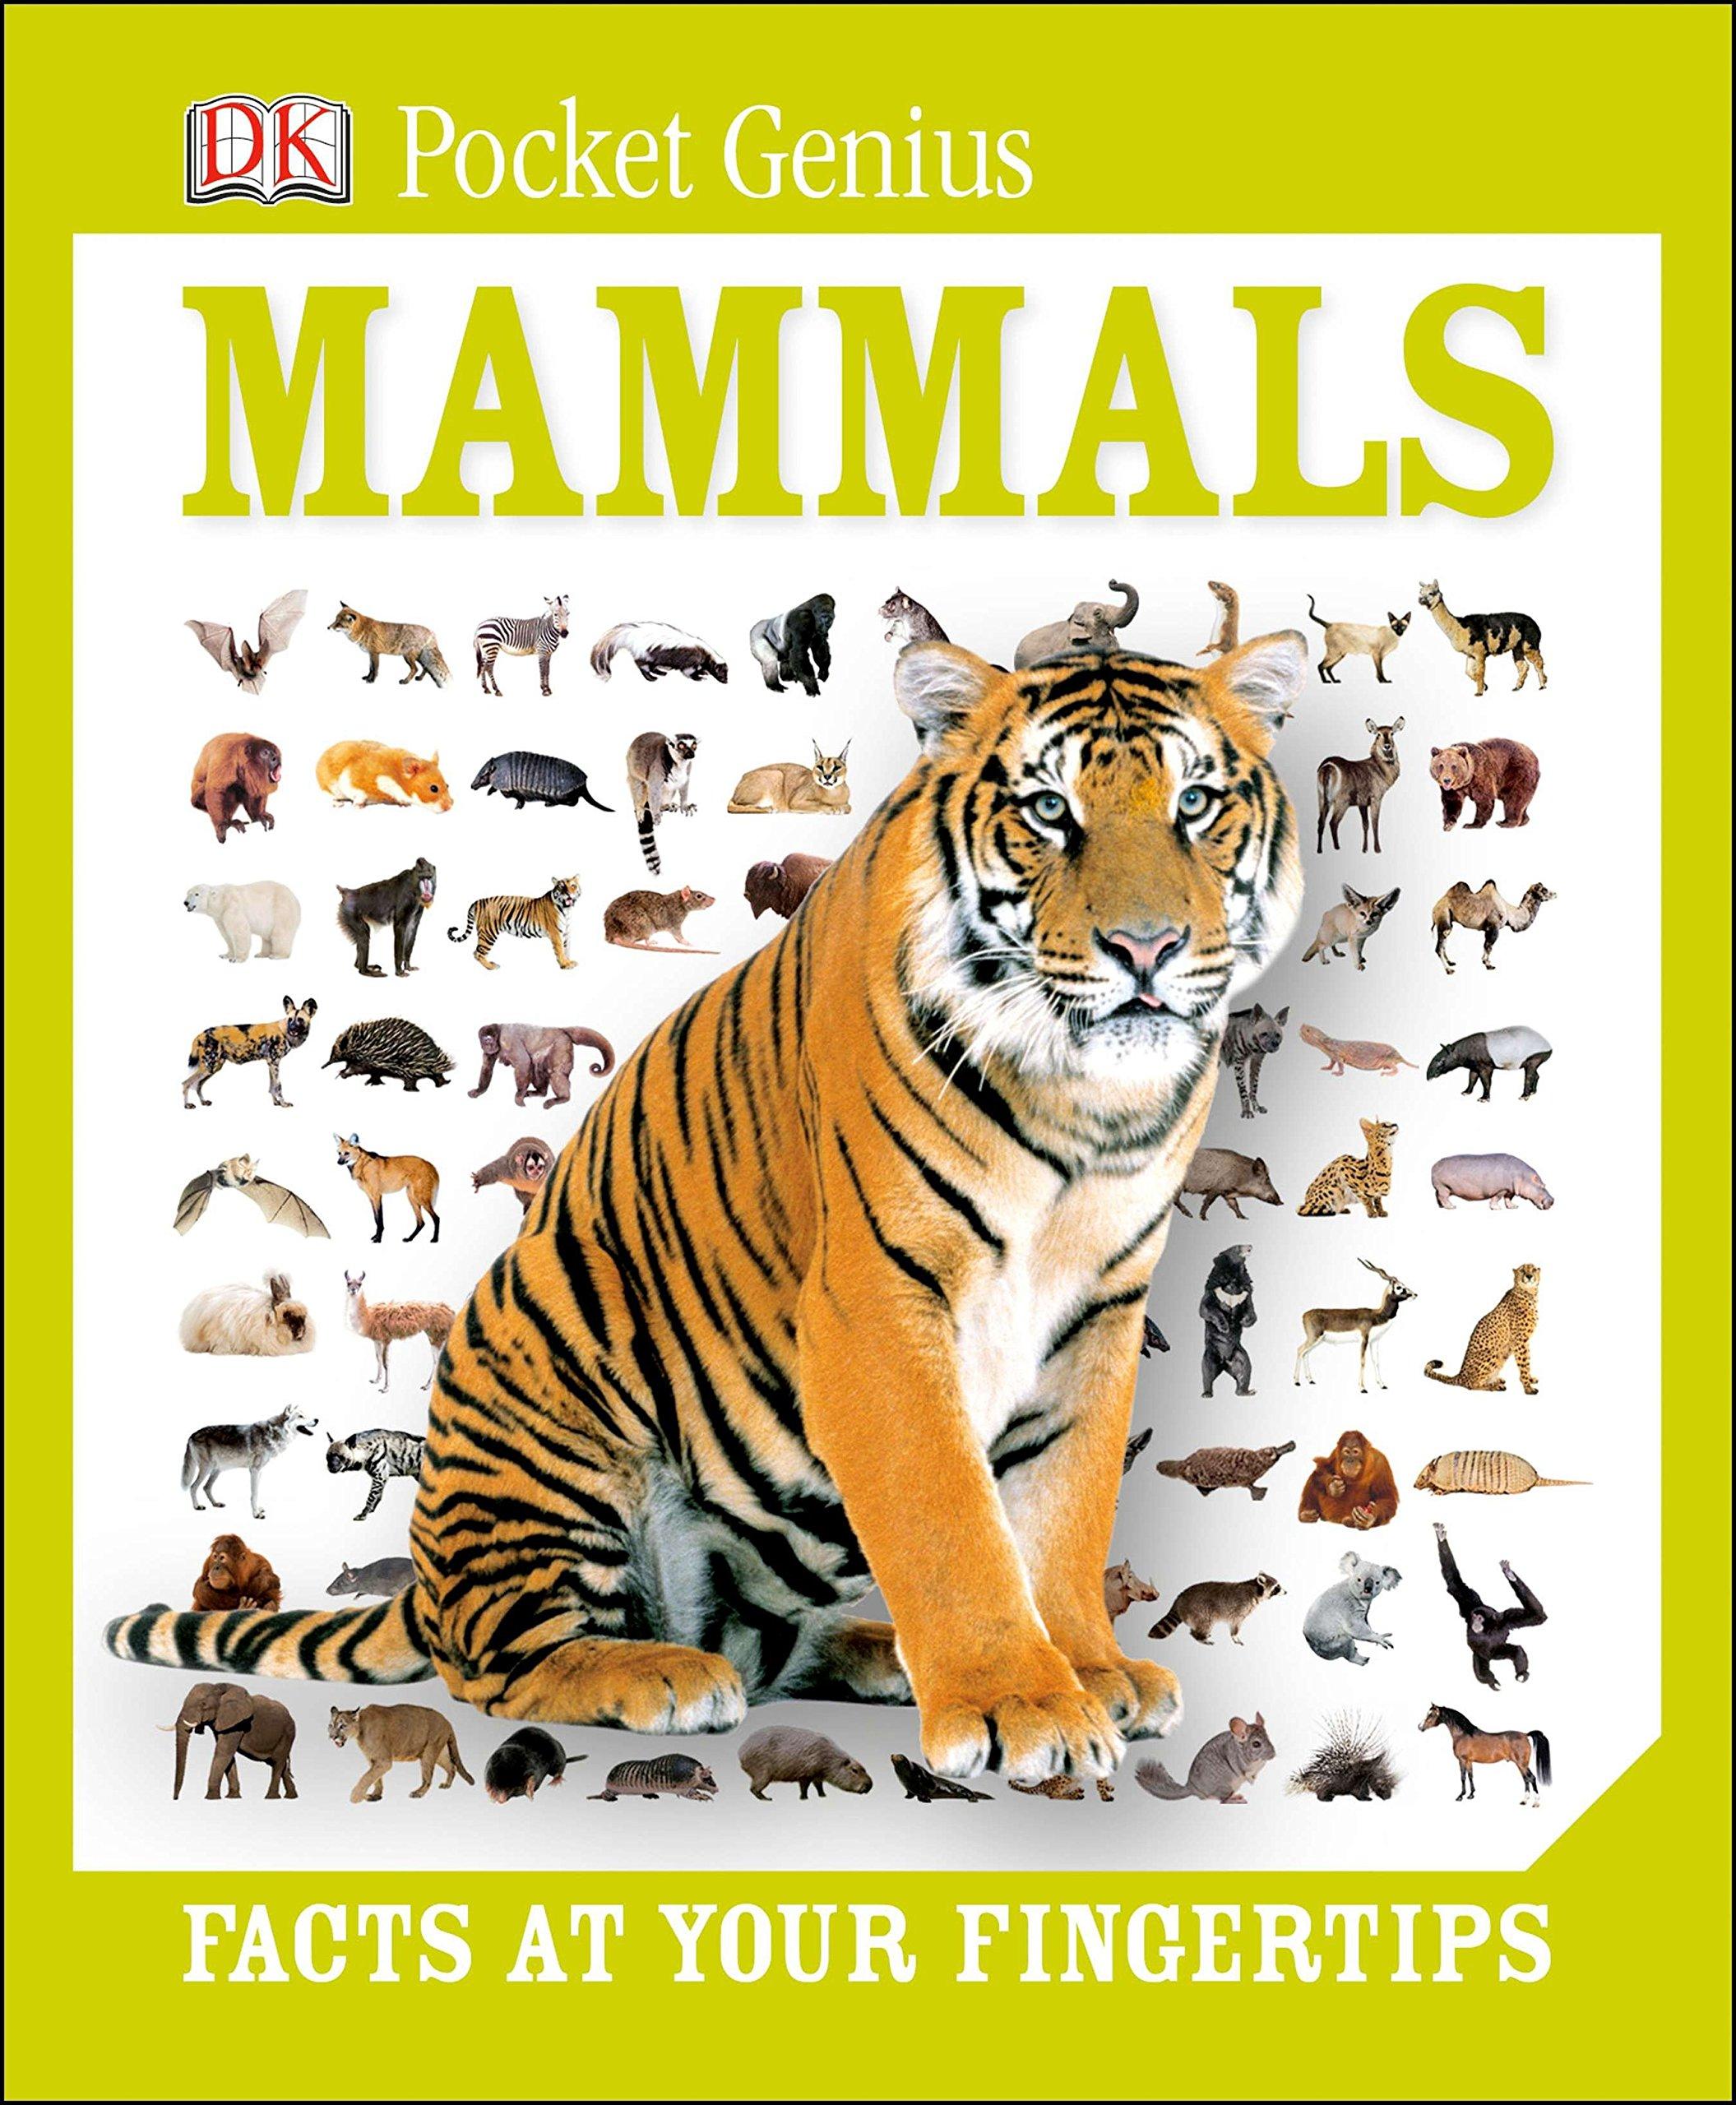 Pocket Genius: Mammals: Facts at Your Fingertips PDF